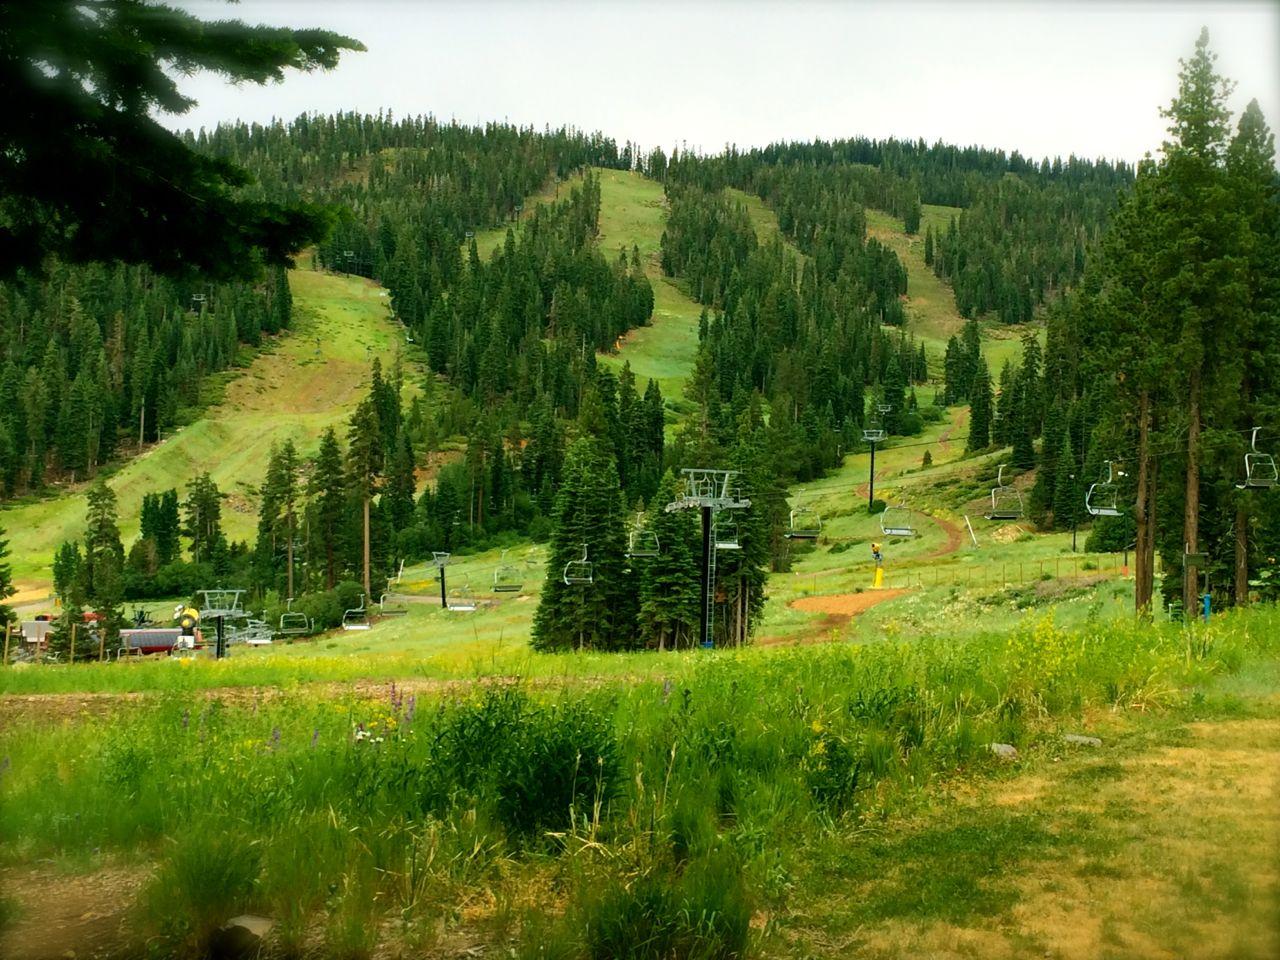 View from Ritz Carlton, Lake Tahoe, CA